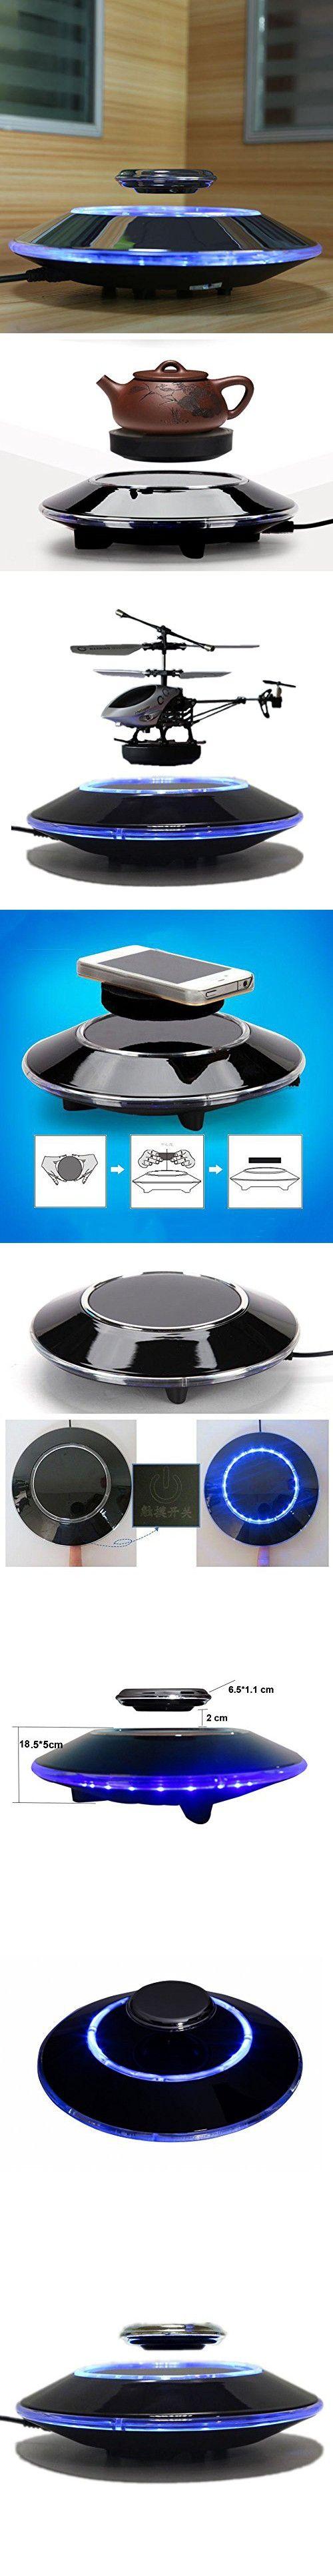 NASKY(TM) UFO Shape Magnetic Levitation Platform Home Decor Float Technology (Black)